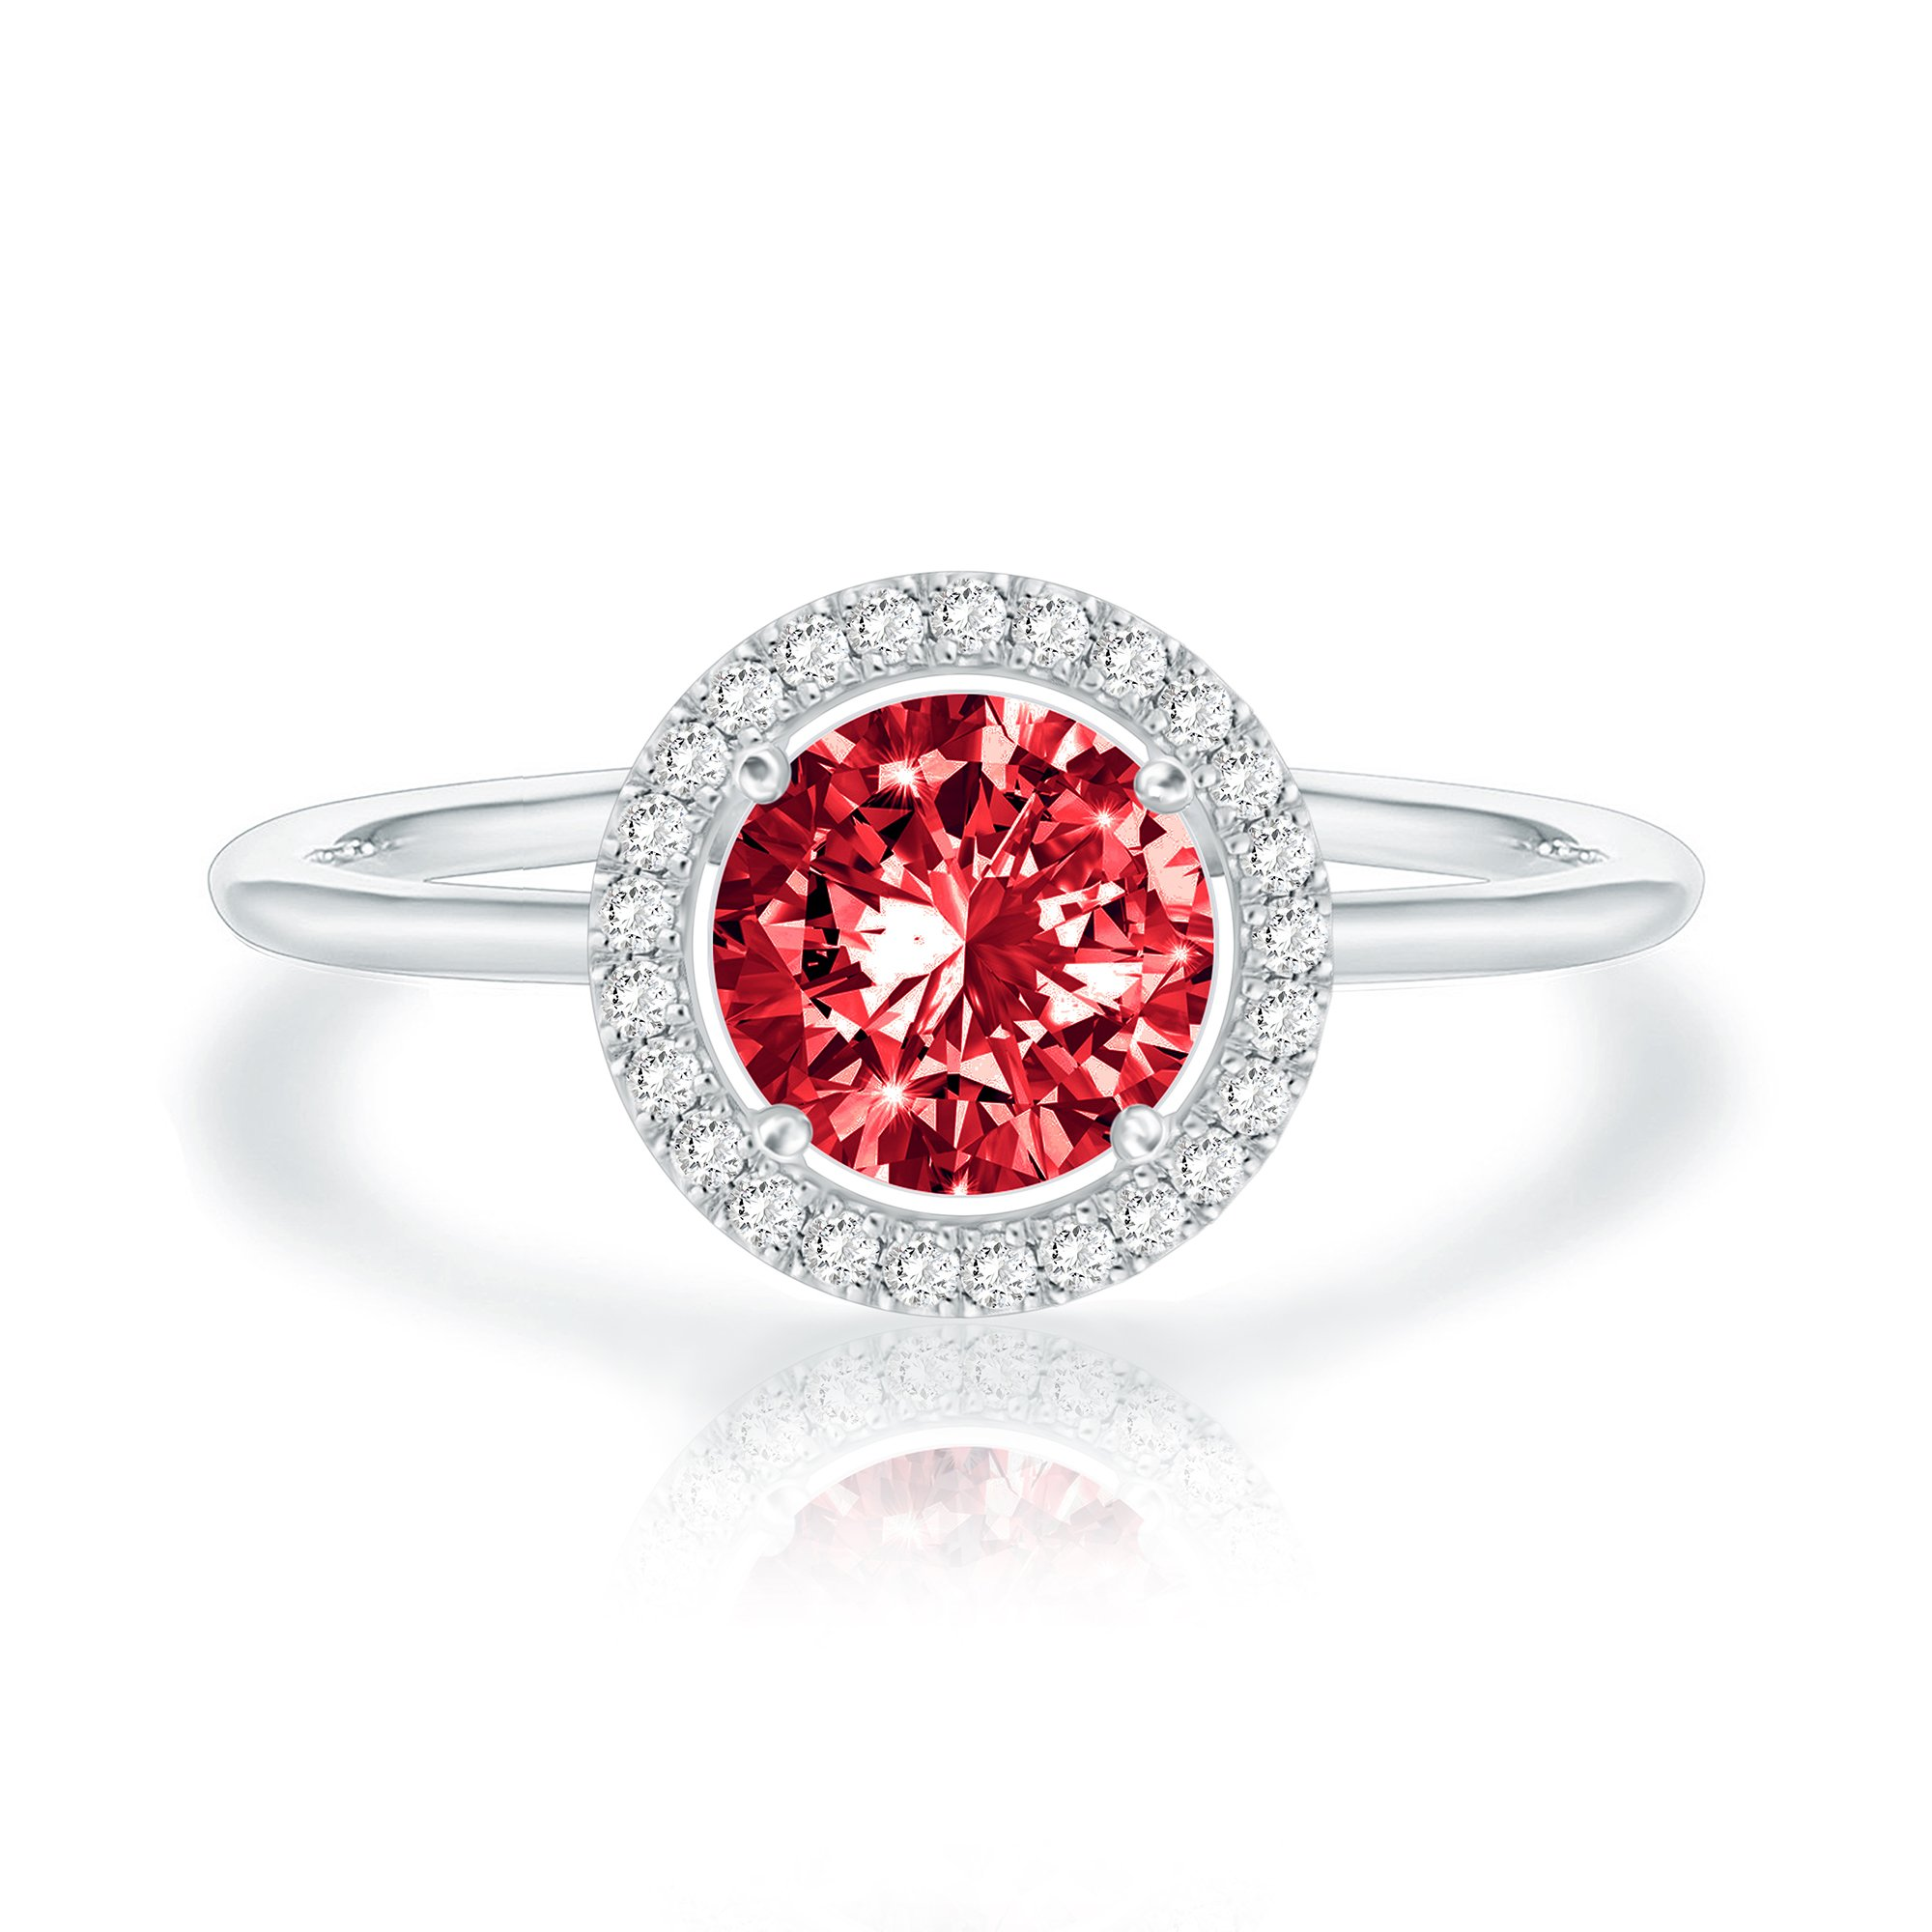 PAVOI 14K Gold Plated SWAROVSKI Crystal Birthstone Ring - Adjustable Stackable Ring July